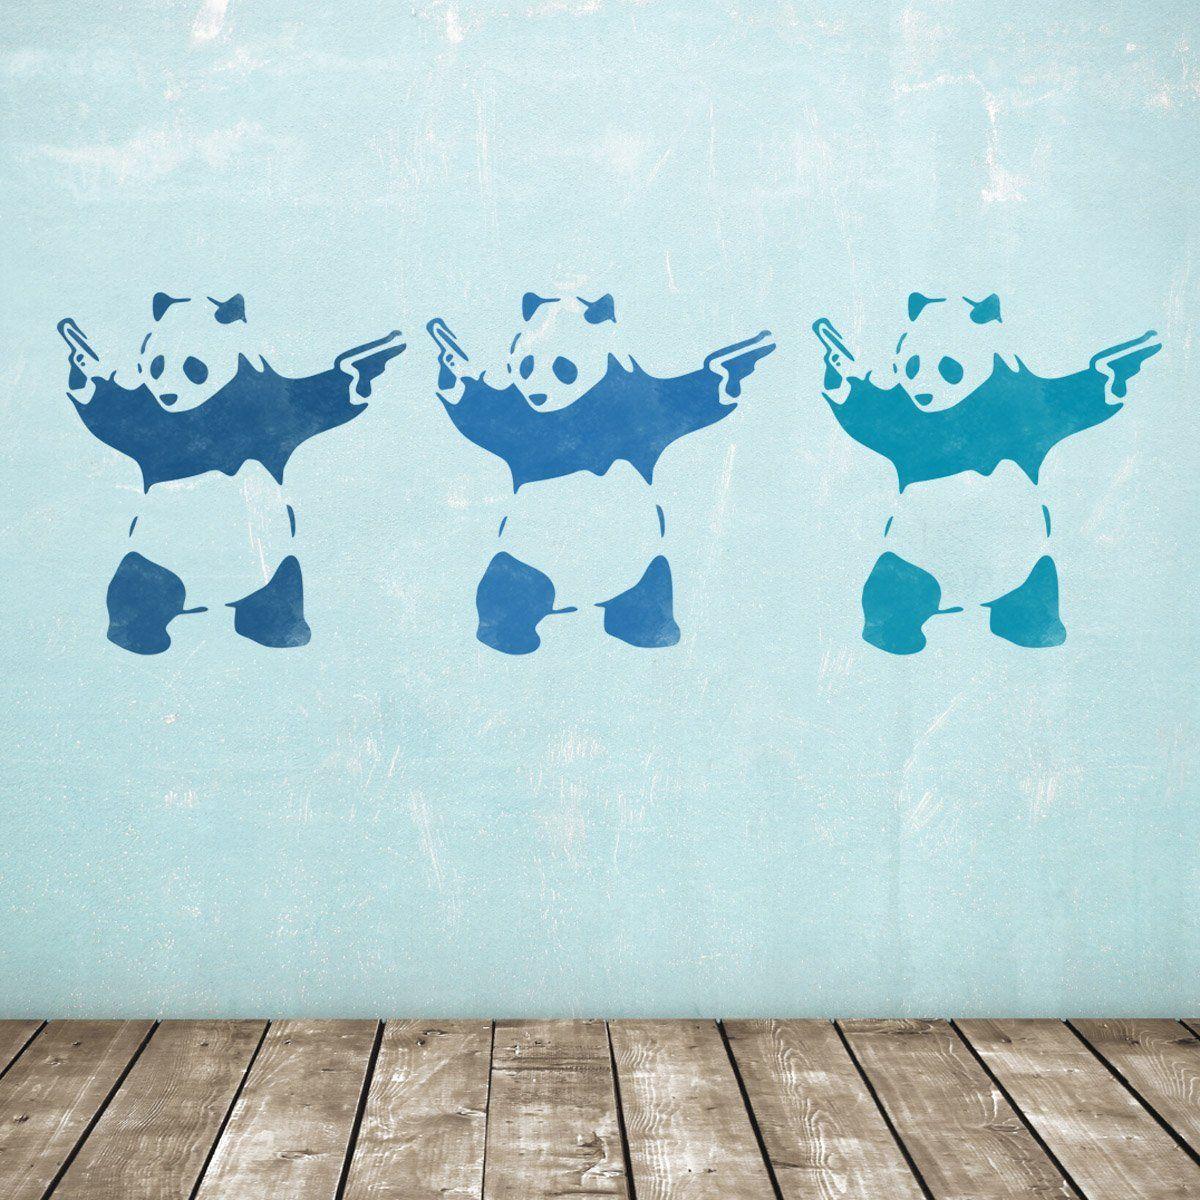 Craftstar large banksy panda wall stencil reusable mylar